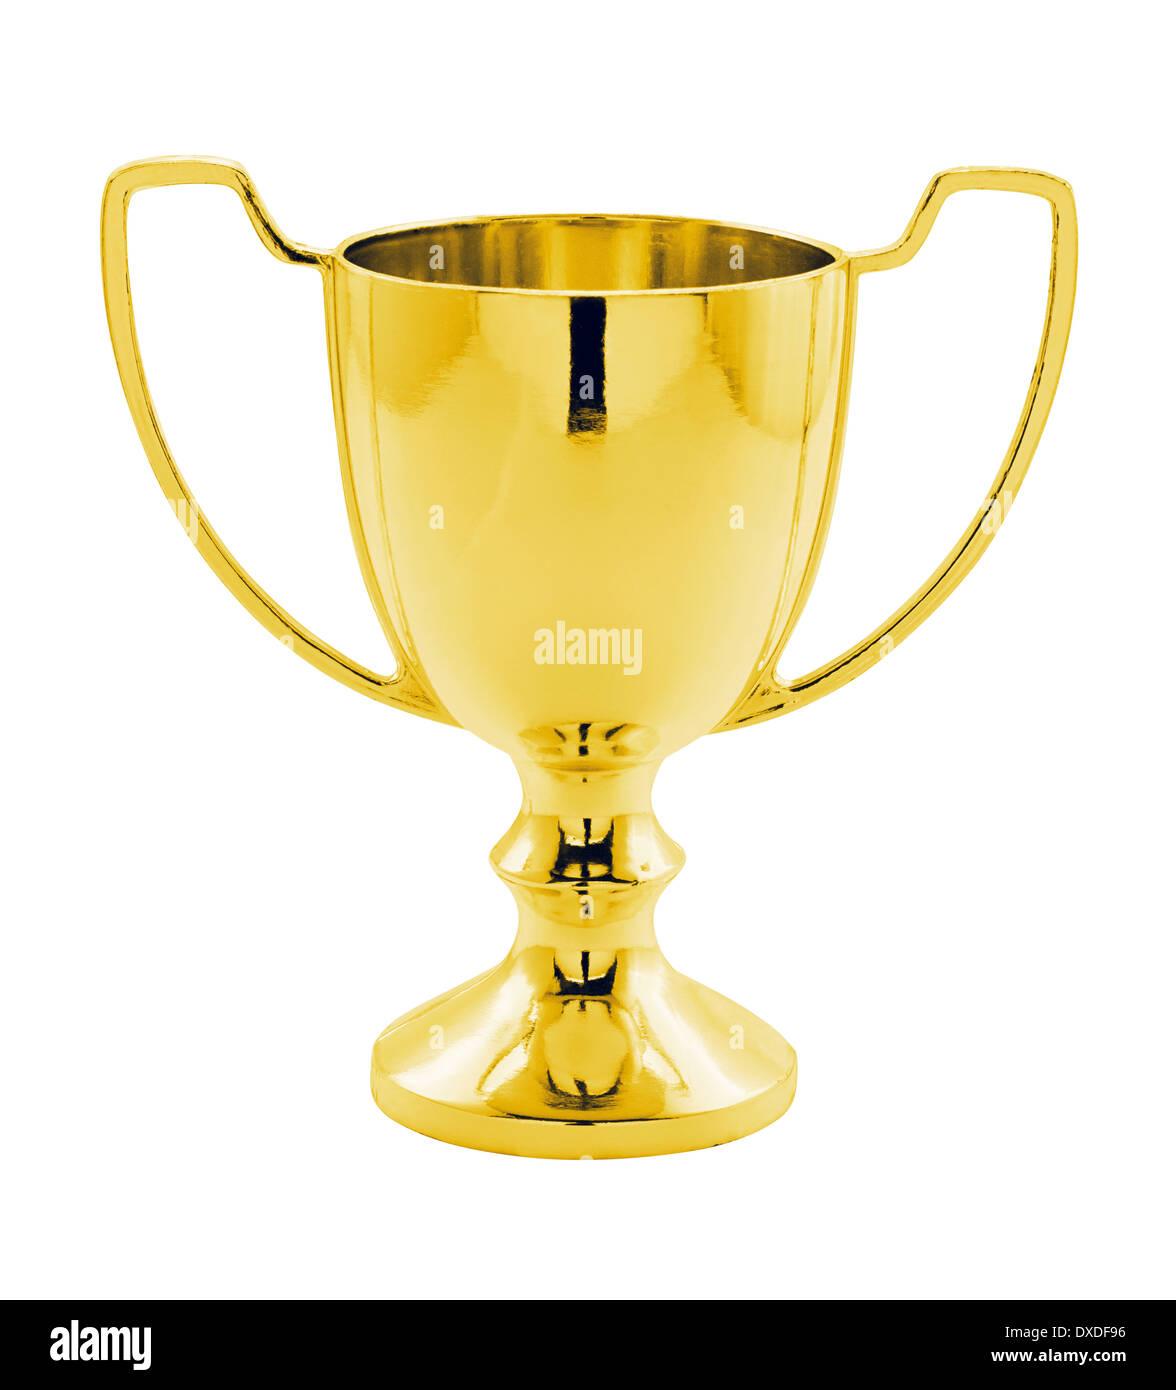 Los ganadores de oro trofeo contra un fondo blanco gran concepto de logro, éxito o ganar un concurso o premio. Imagen De Stock